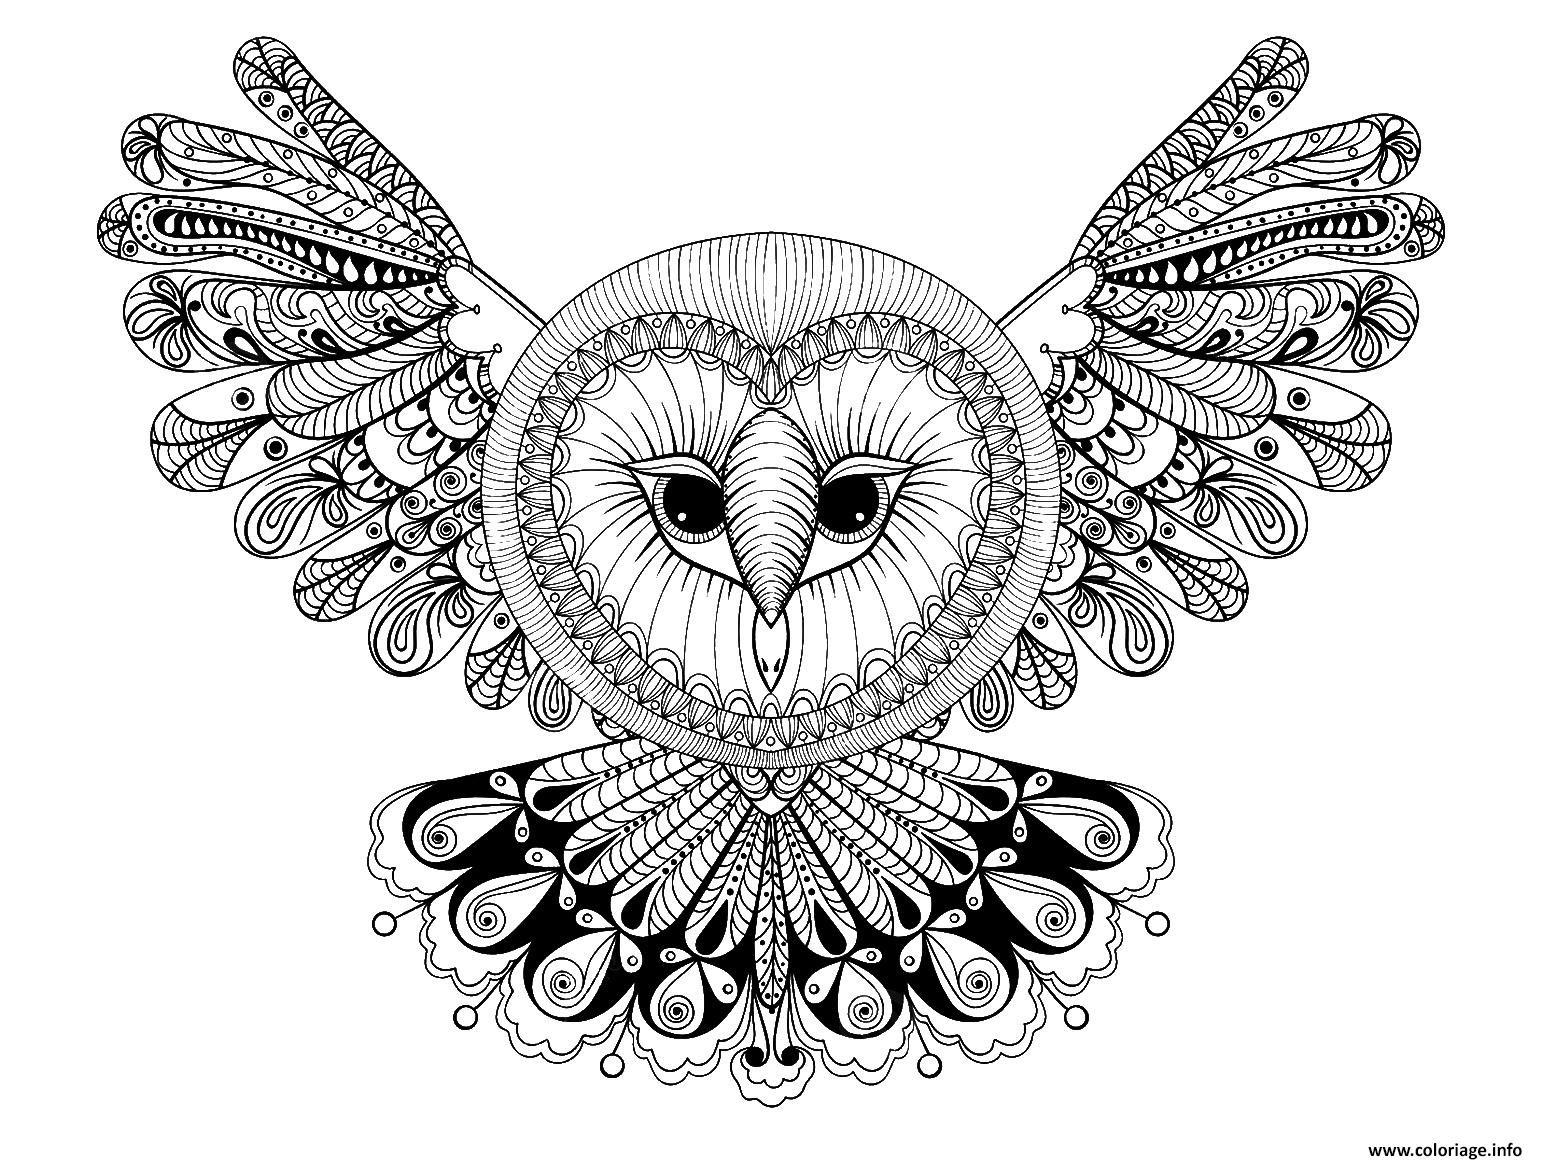 Coloriage Hibou Avec Grande Tete Forme Mandala Adulte Animaux Dessin  Imprimer